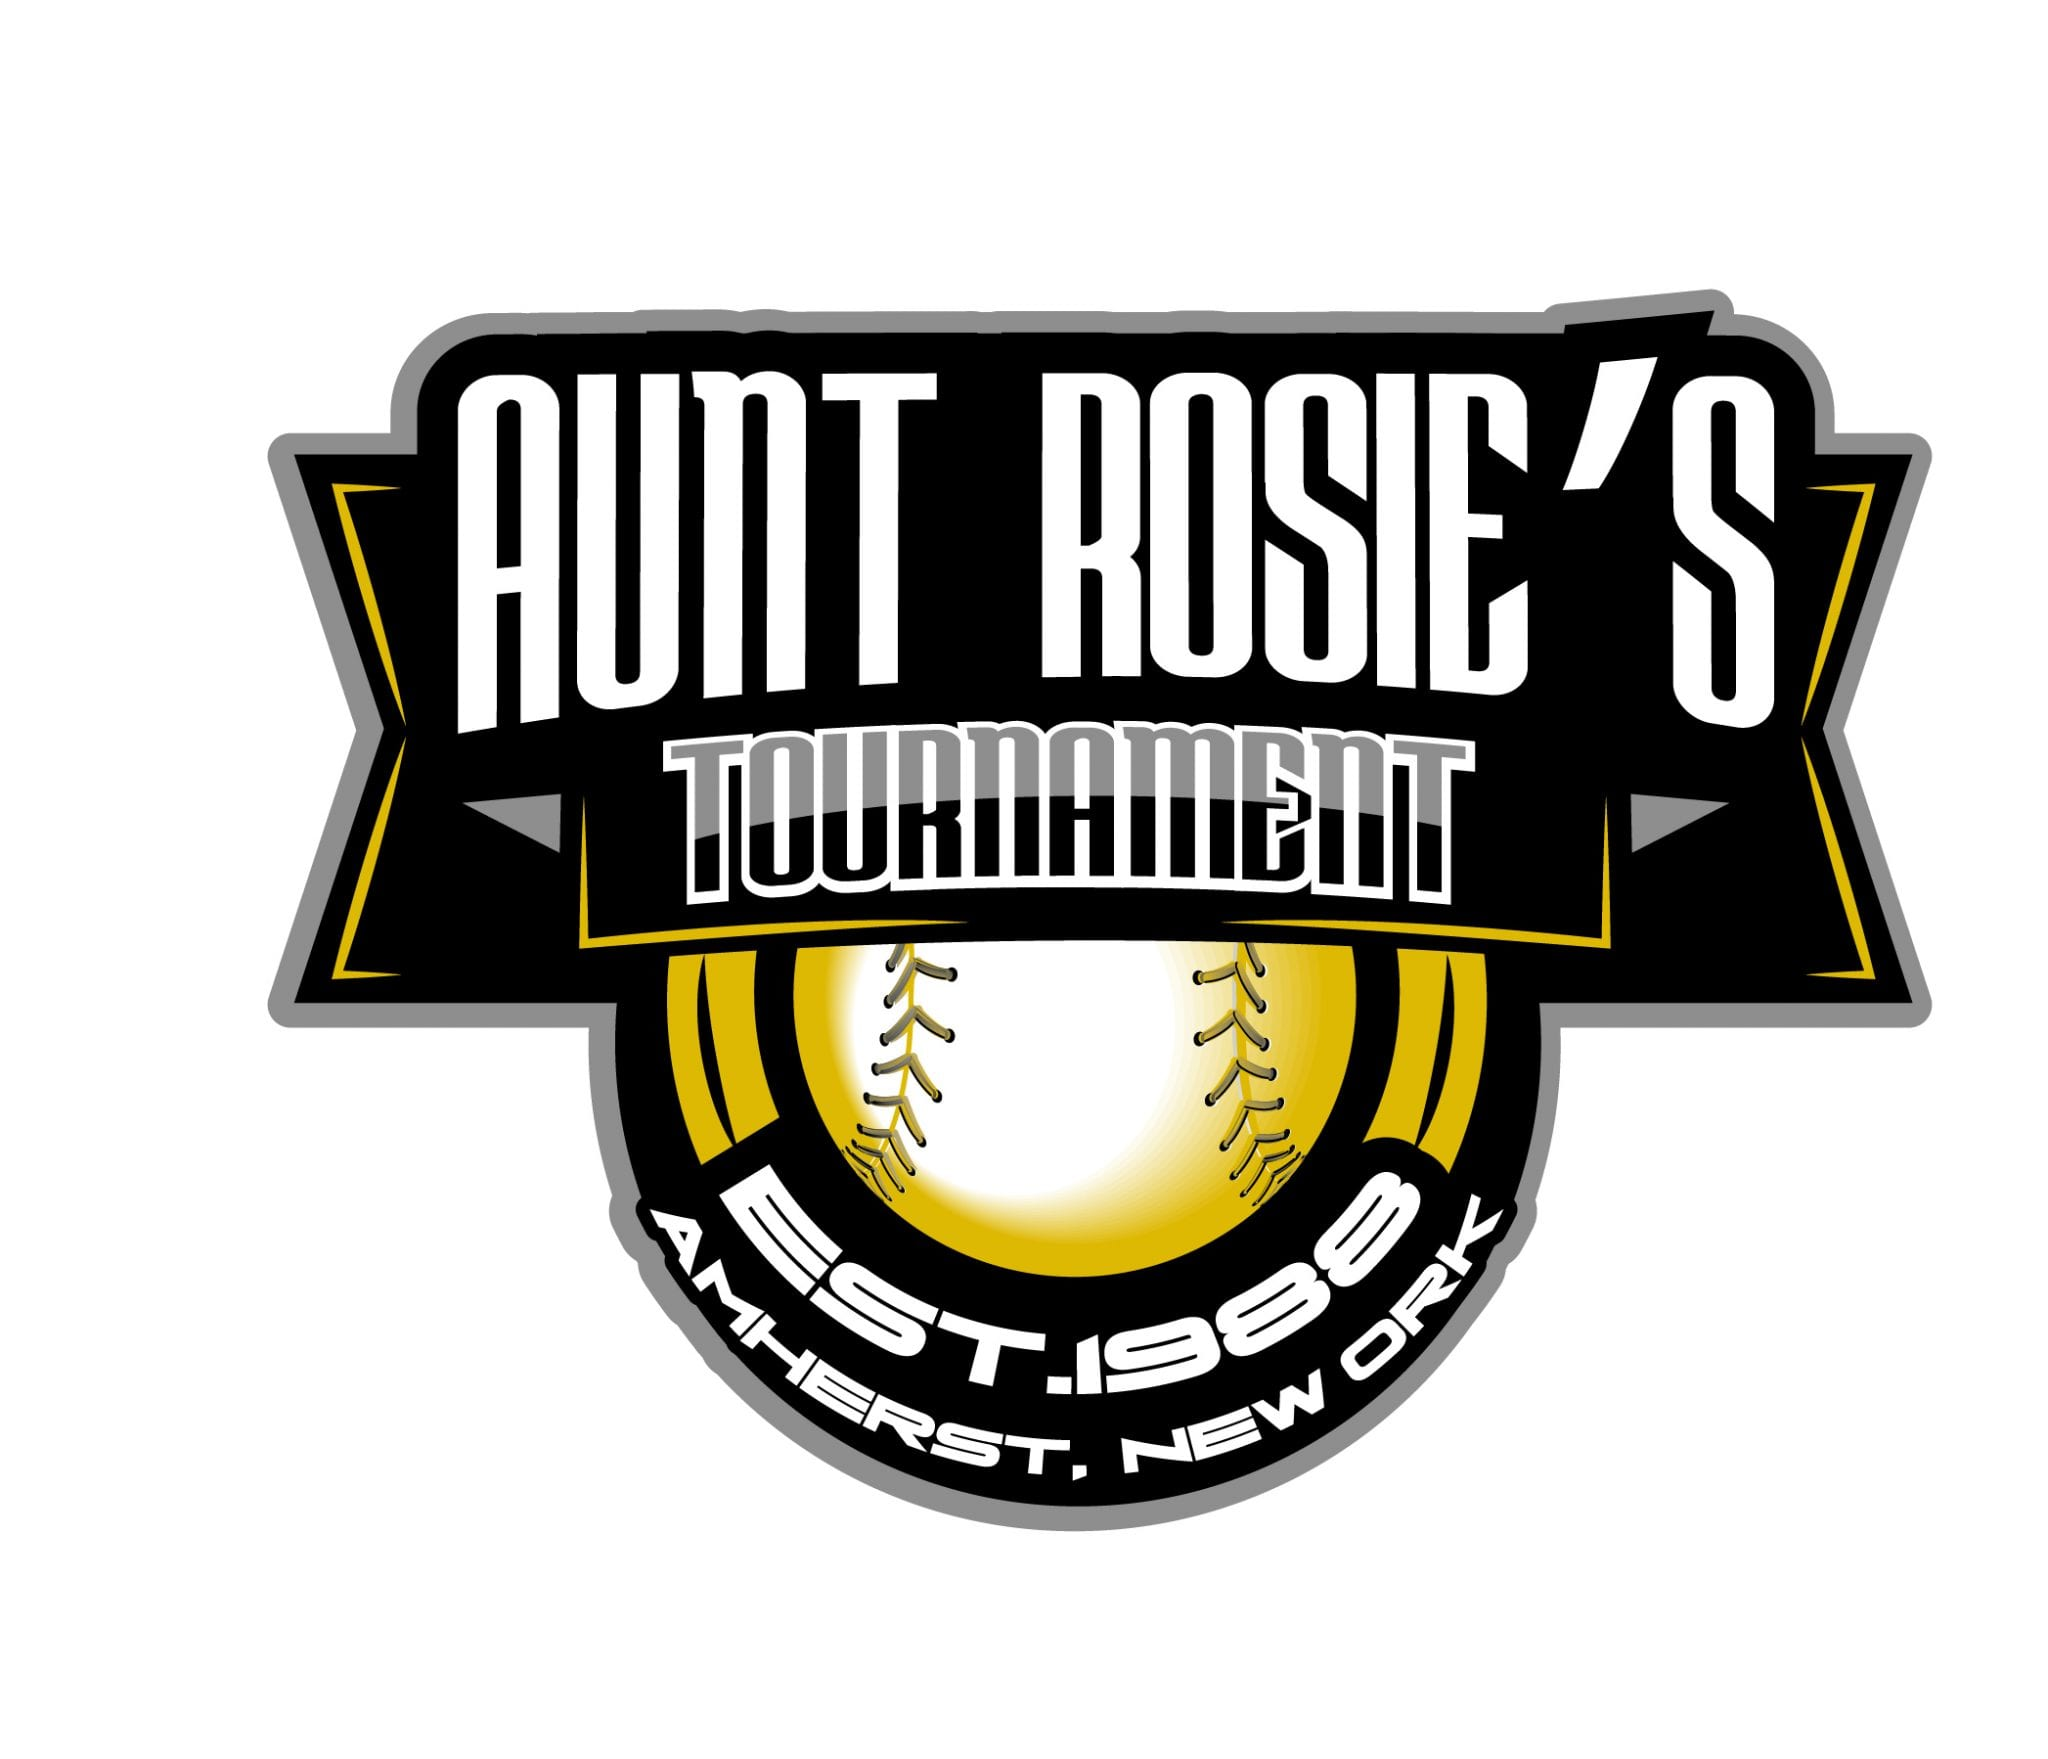 Design t shirts logo - Vector Logo Design For Tshirt 2015 Aunt Rosie S International Softball Event